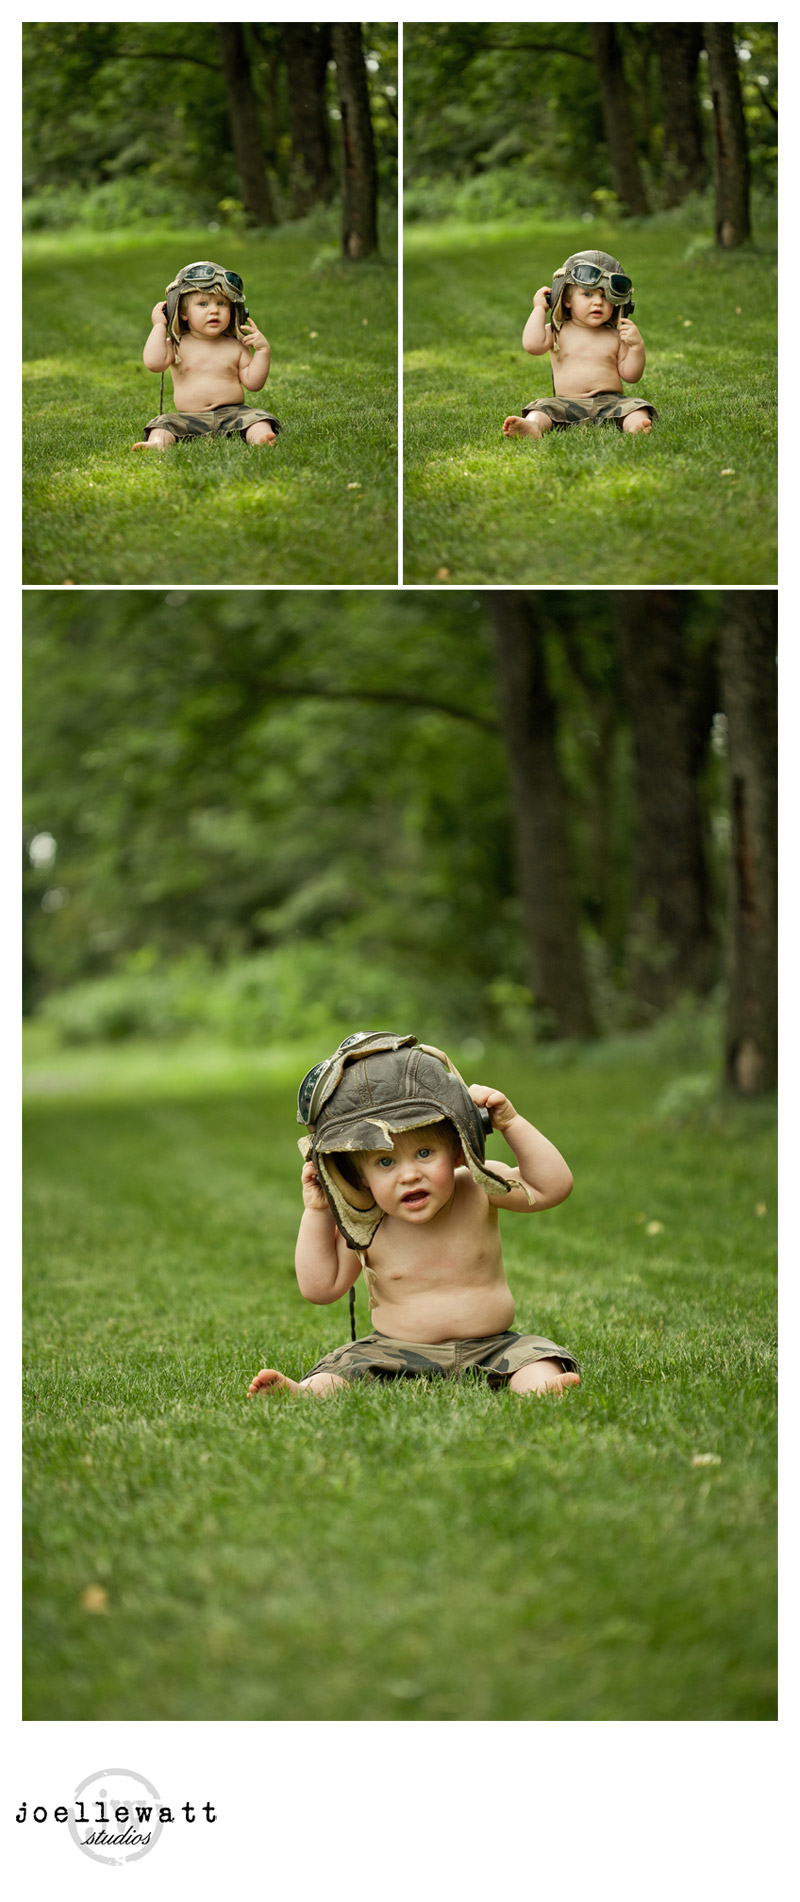 Blog-Collage-1374239074886.jpg